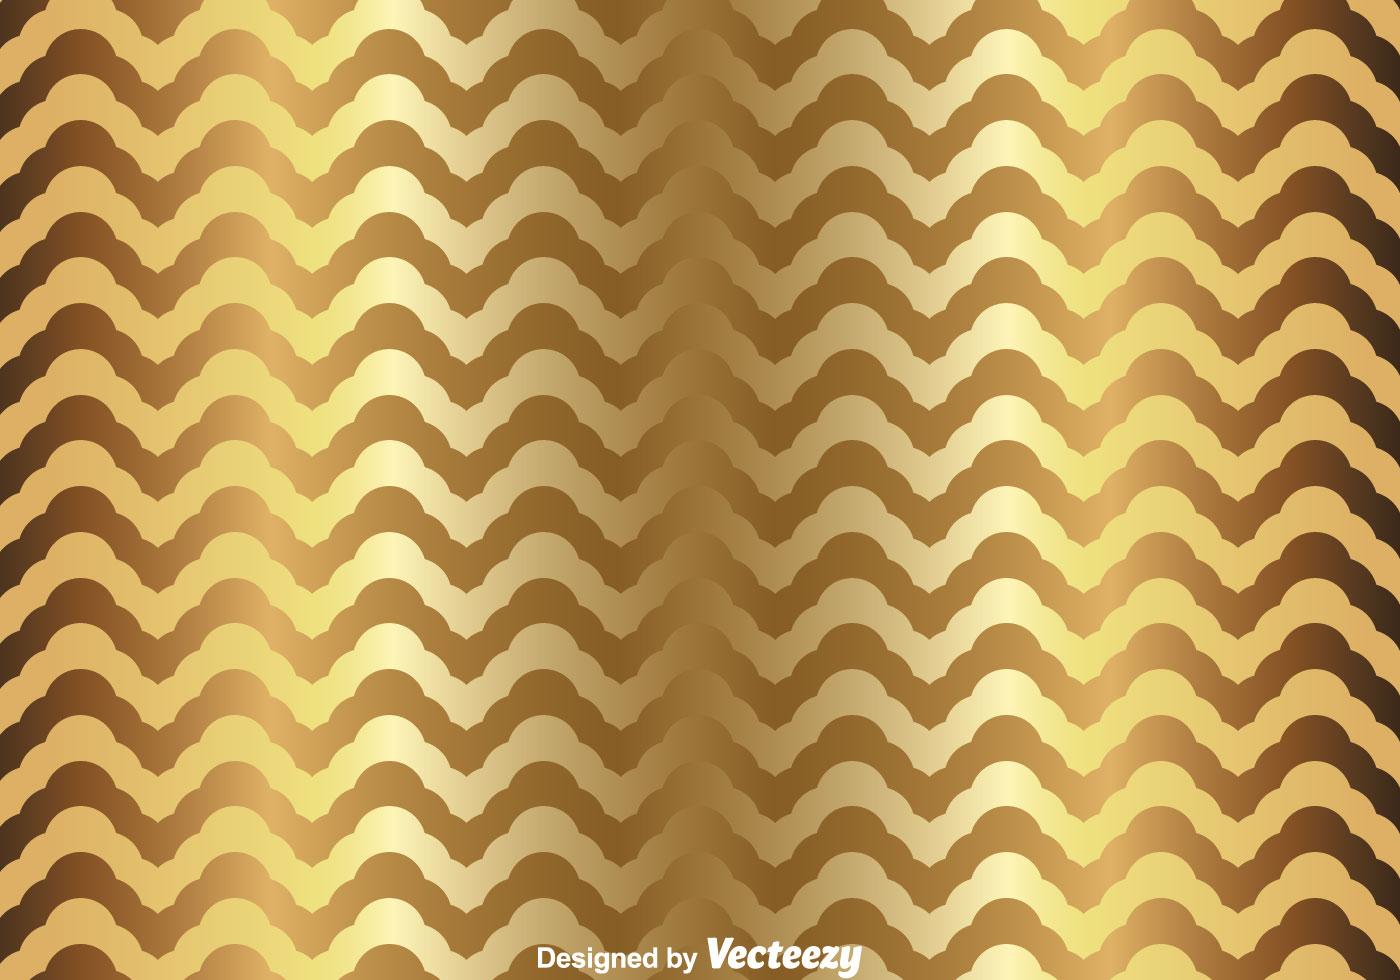 gold chevron pattern download free vector art stock